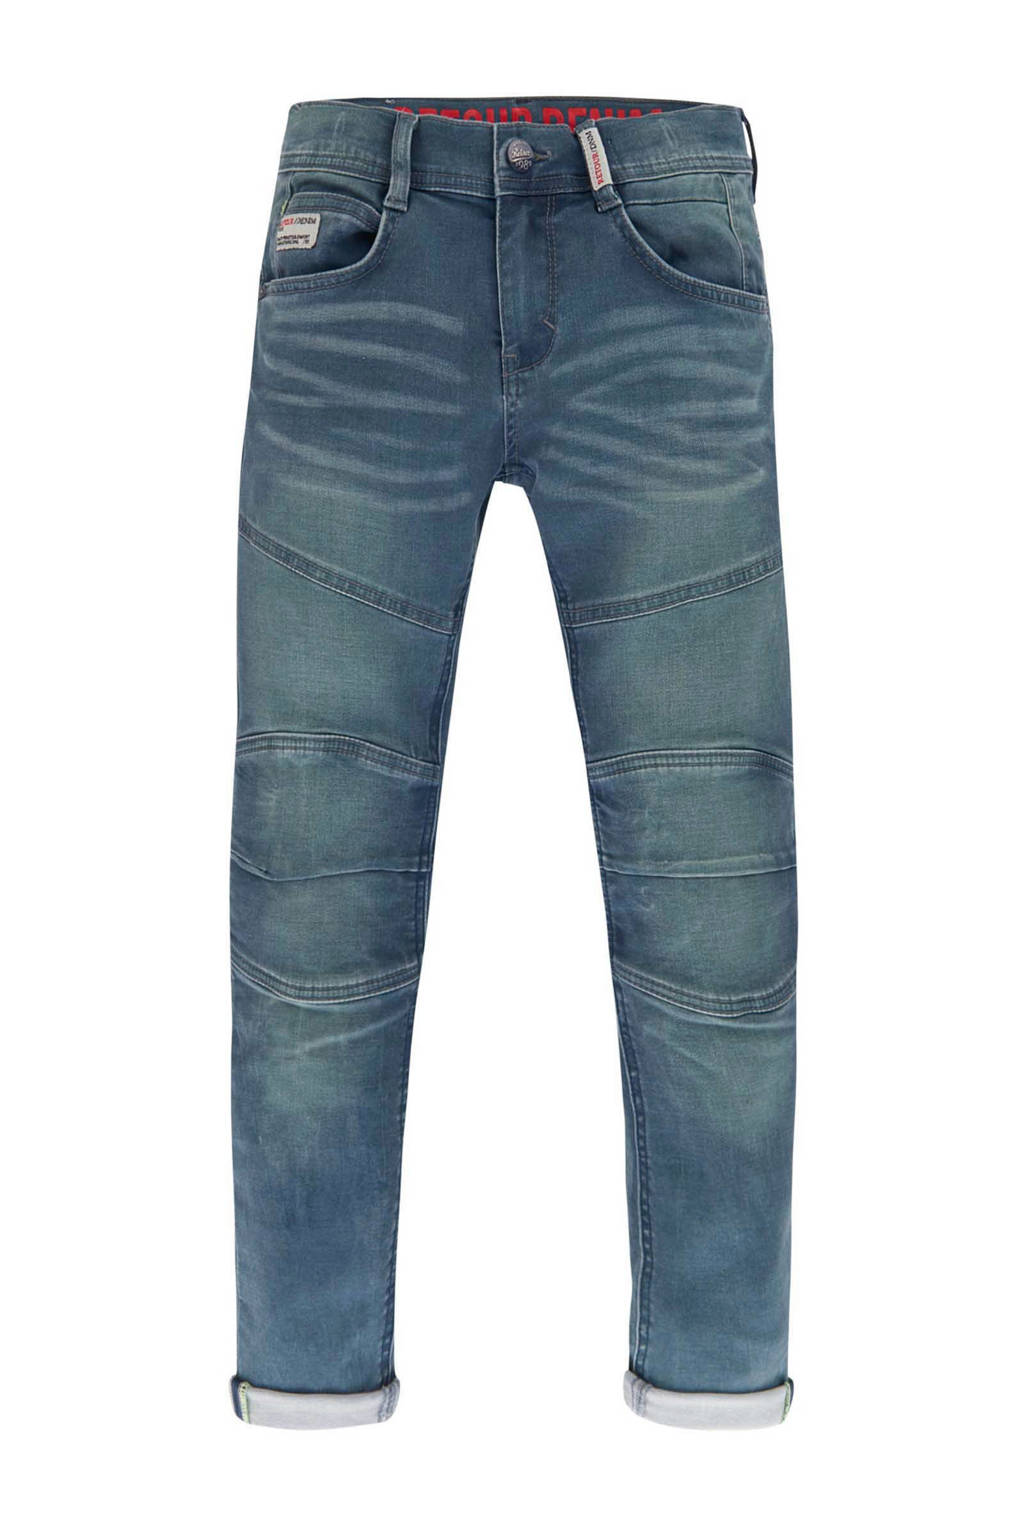 Retour Denim slim fit jeans Yves, Denim blauw